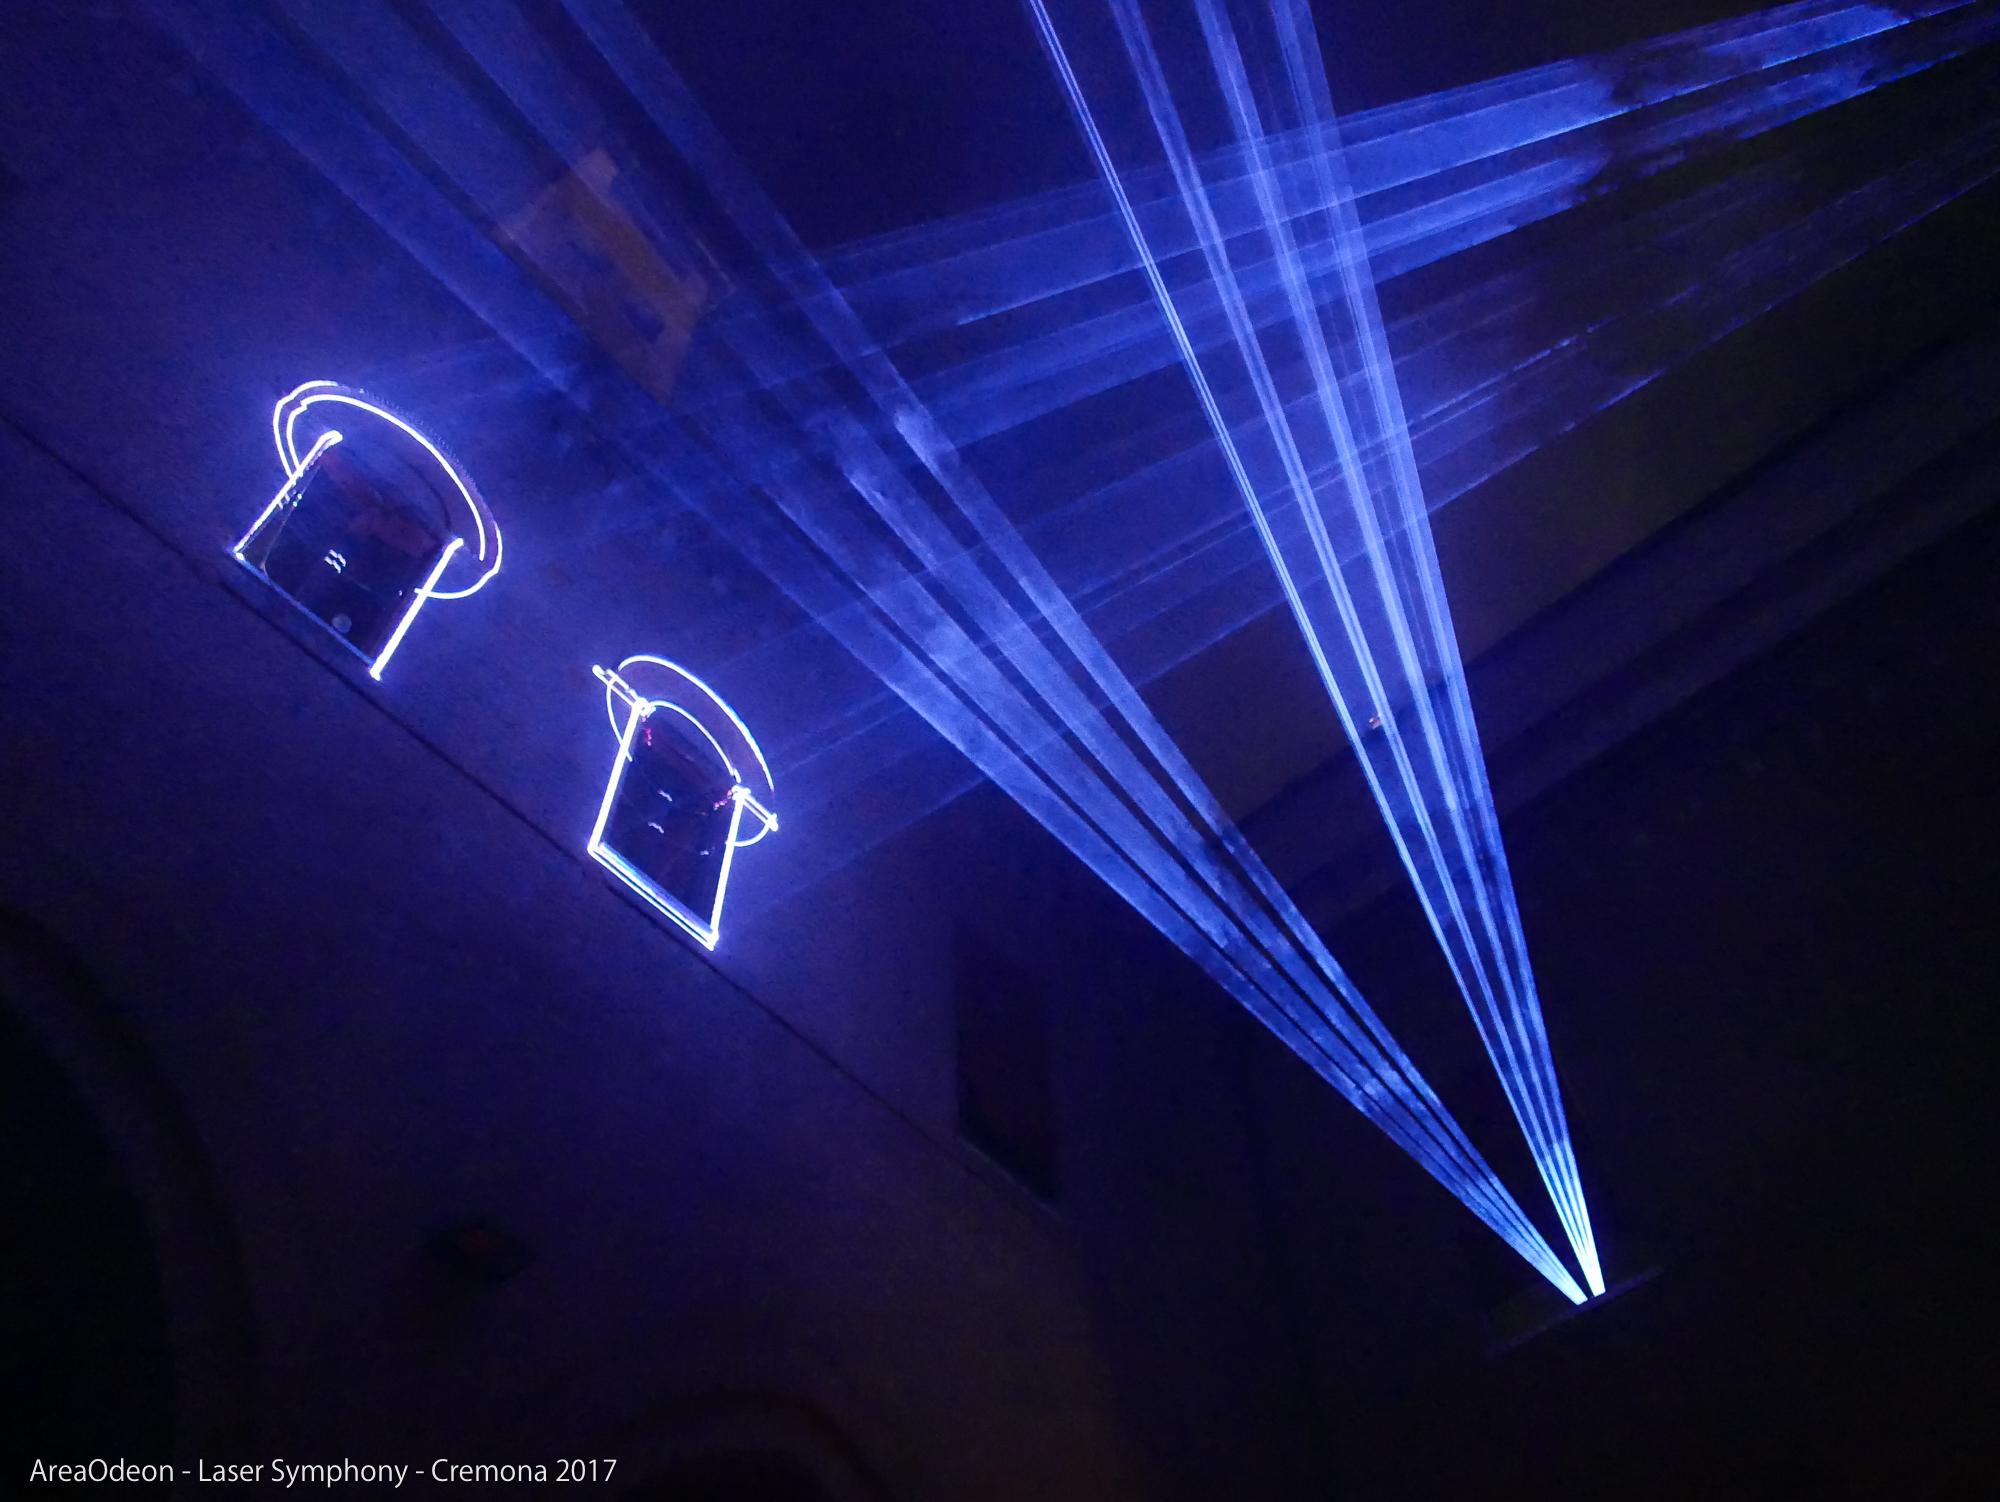 areaodeon laser symphony cremona